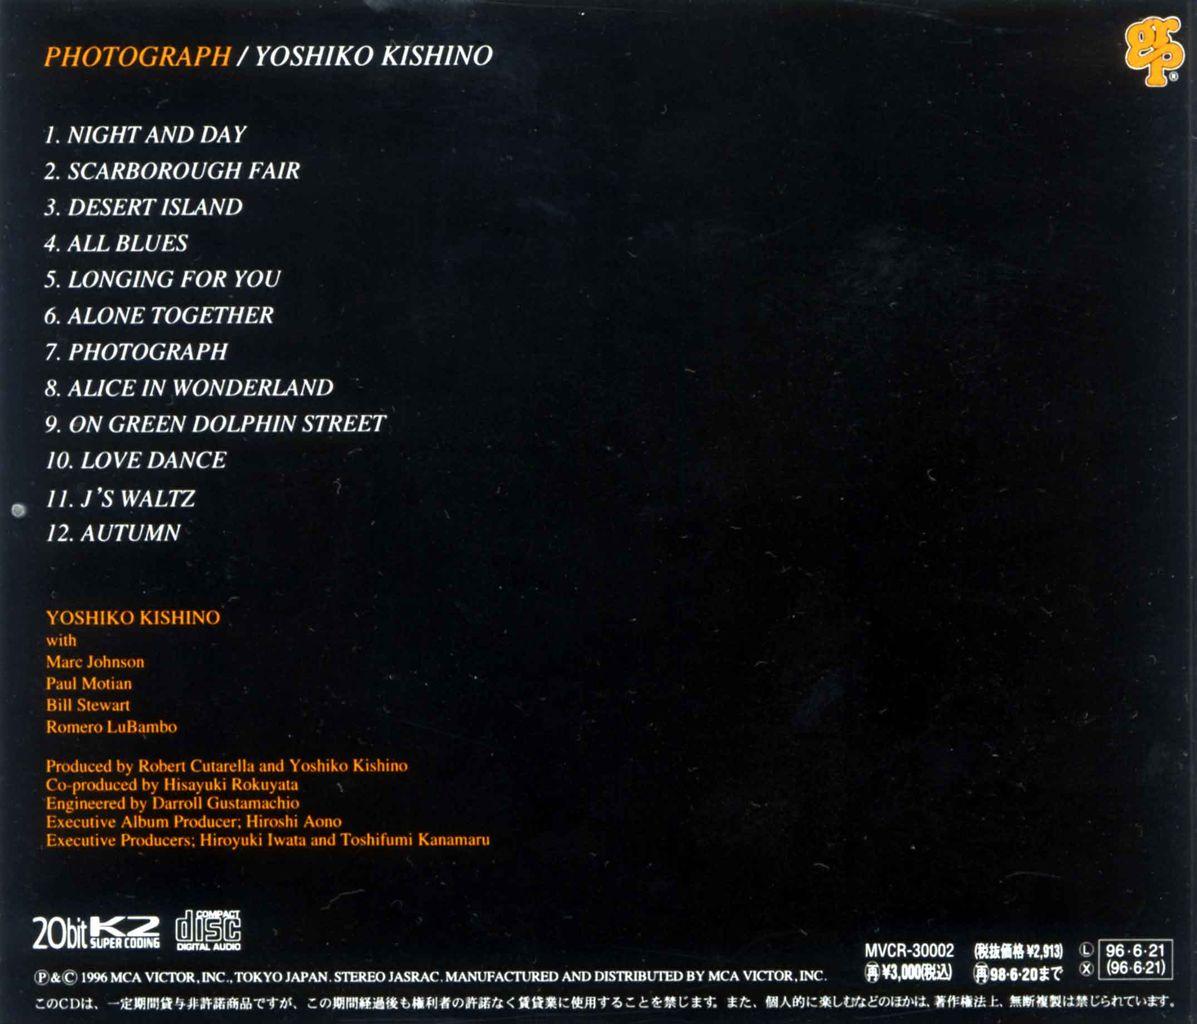 PHOTOGRAPH-2